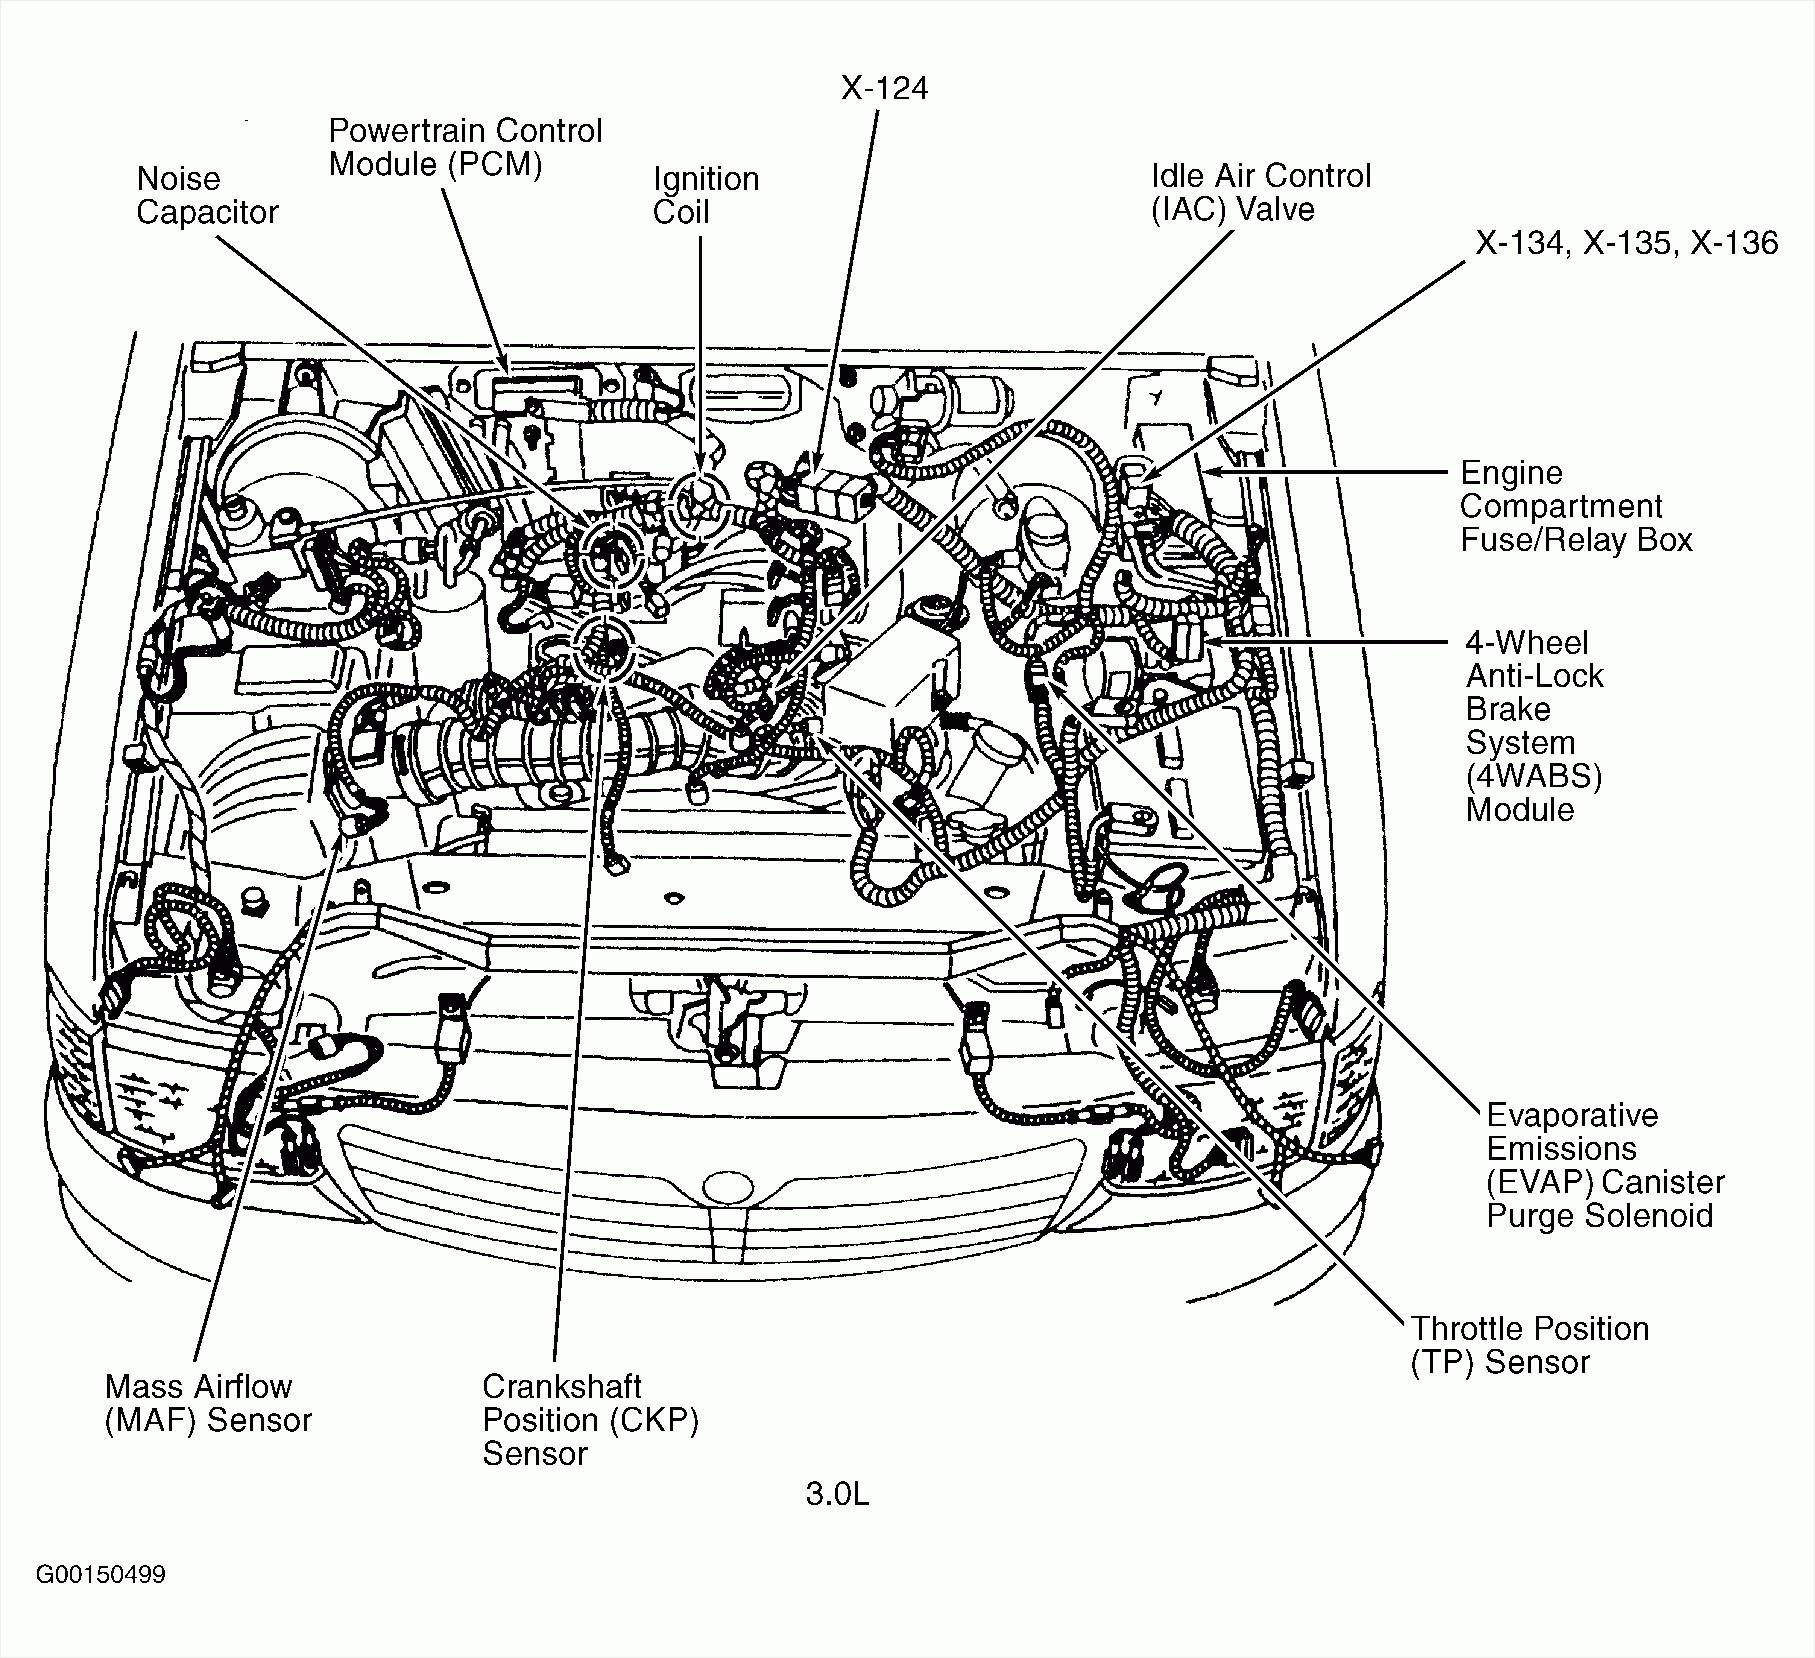 3 1 Liter V6 Engine Diagram 2004 Mazda 6 V6 Engine Diagram Wiring Diagrams Of 3 1 Liter V6 Engine Diagram